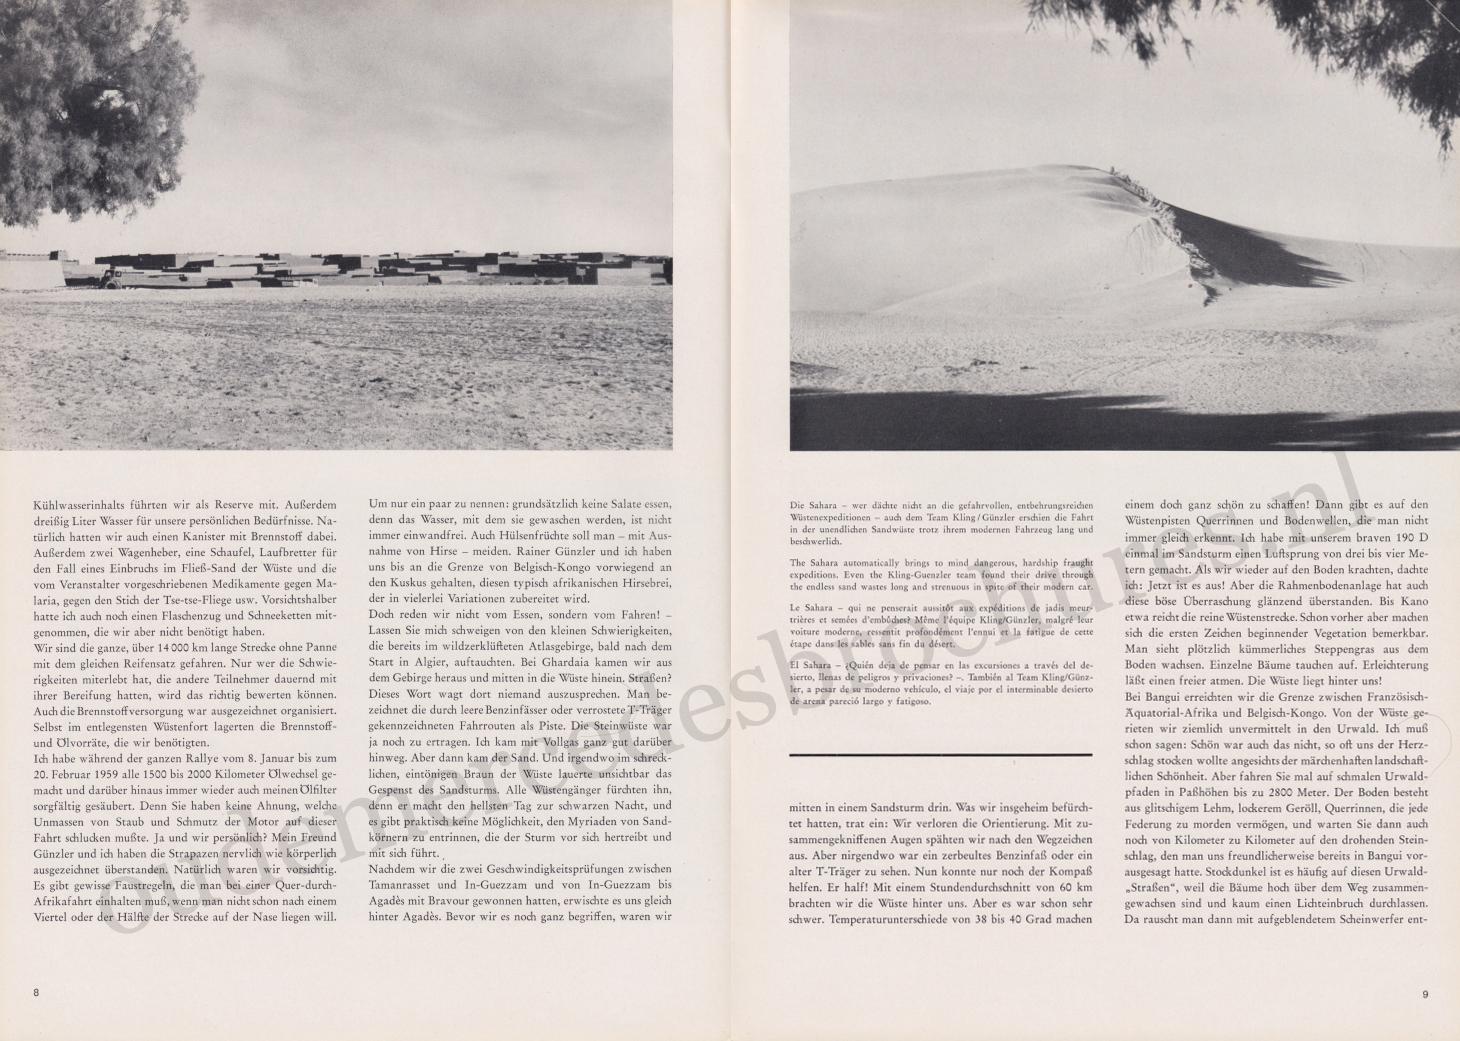 (REVISTA): Periódico In aller welt n.º 31 - Mercedes-Benz no mundo - 1959 - multilingue 005